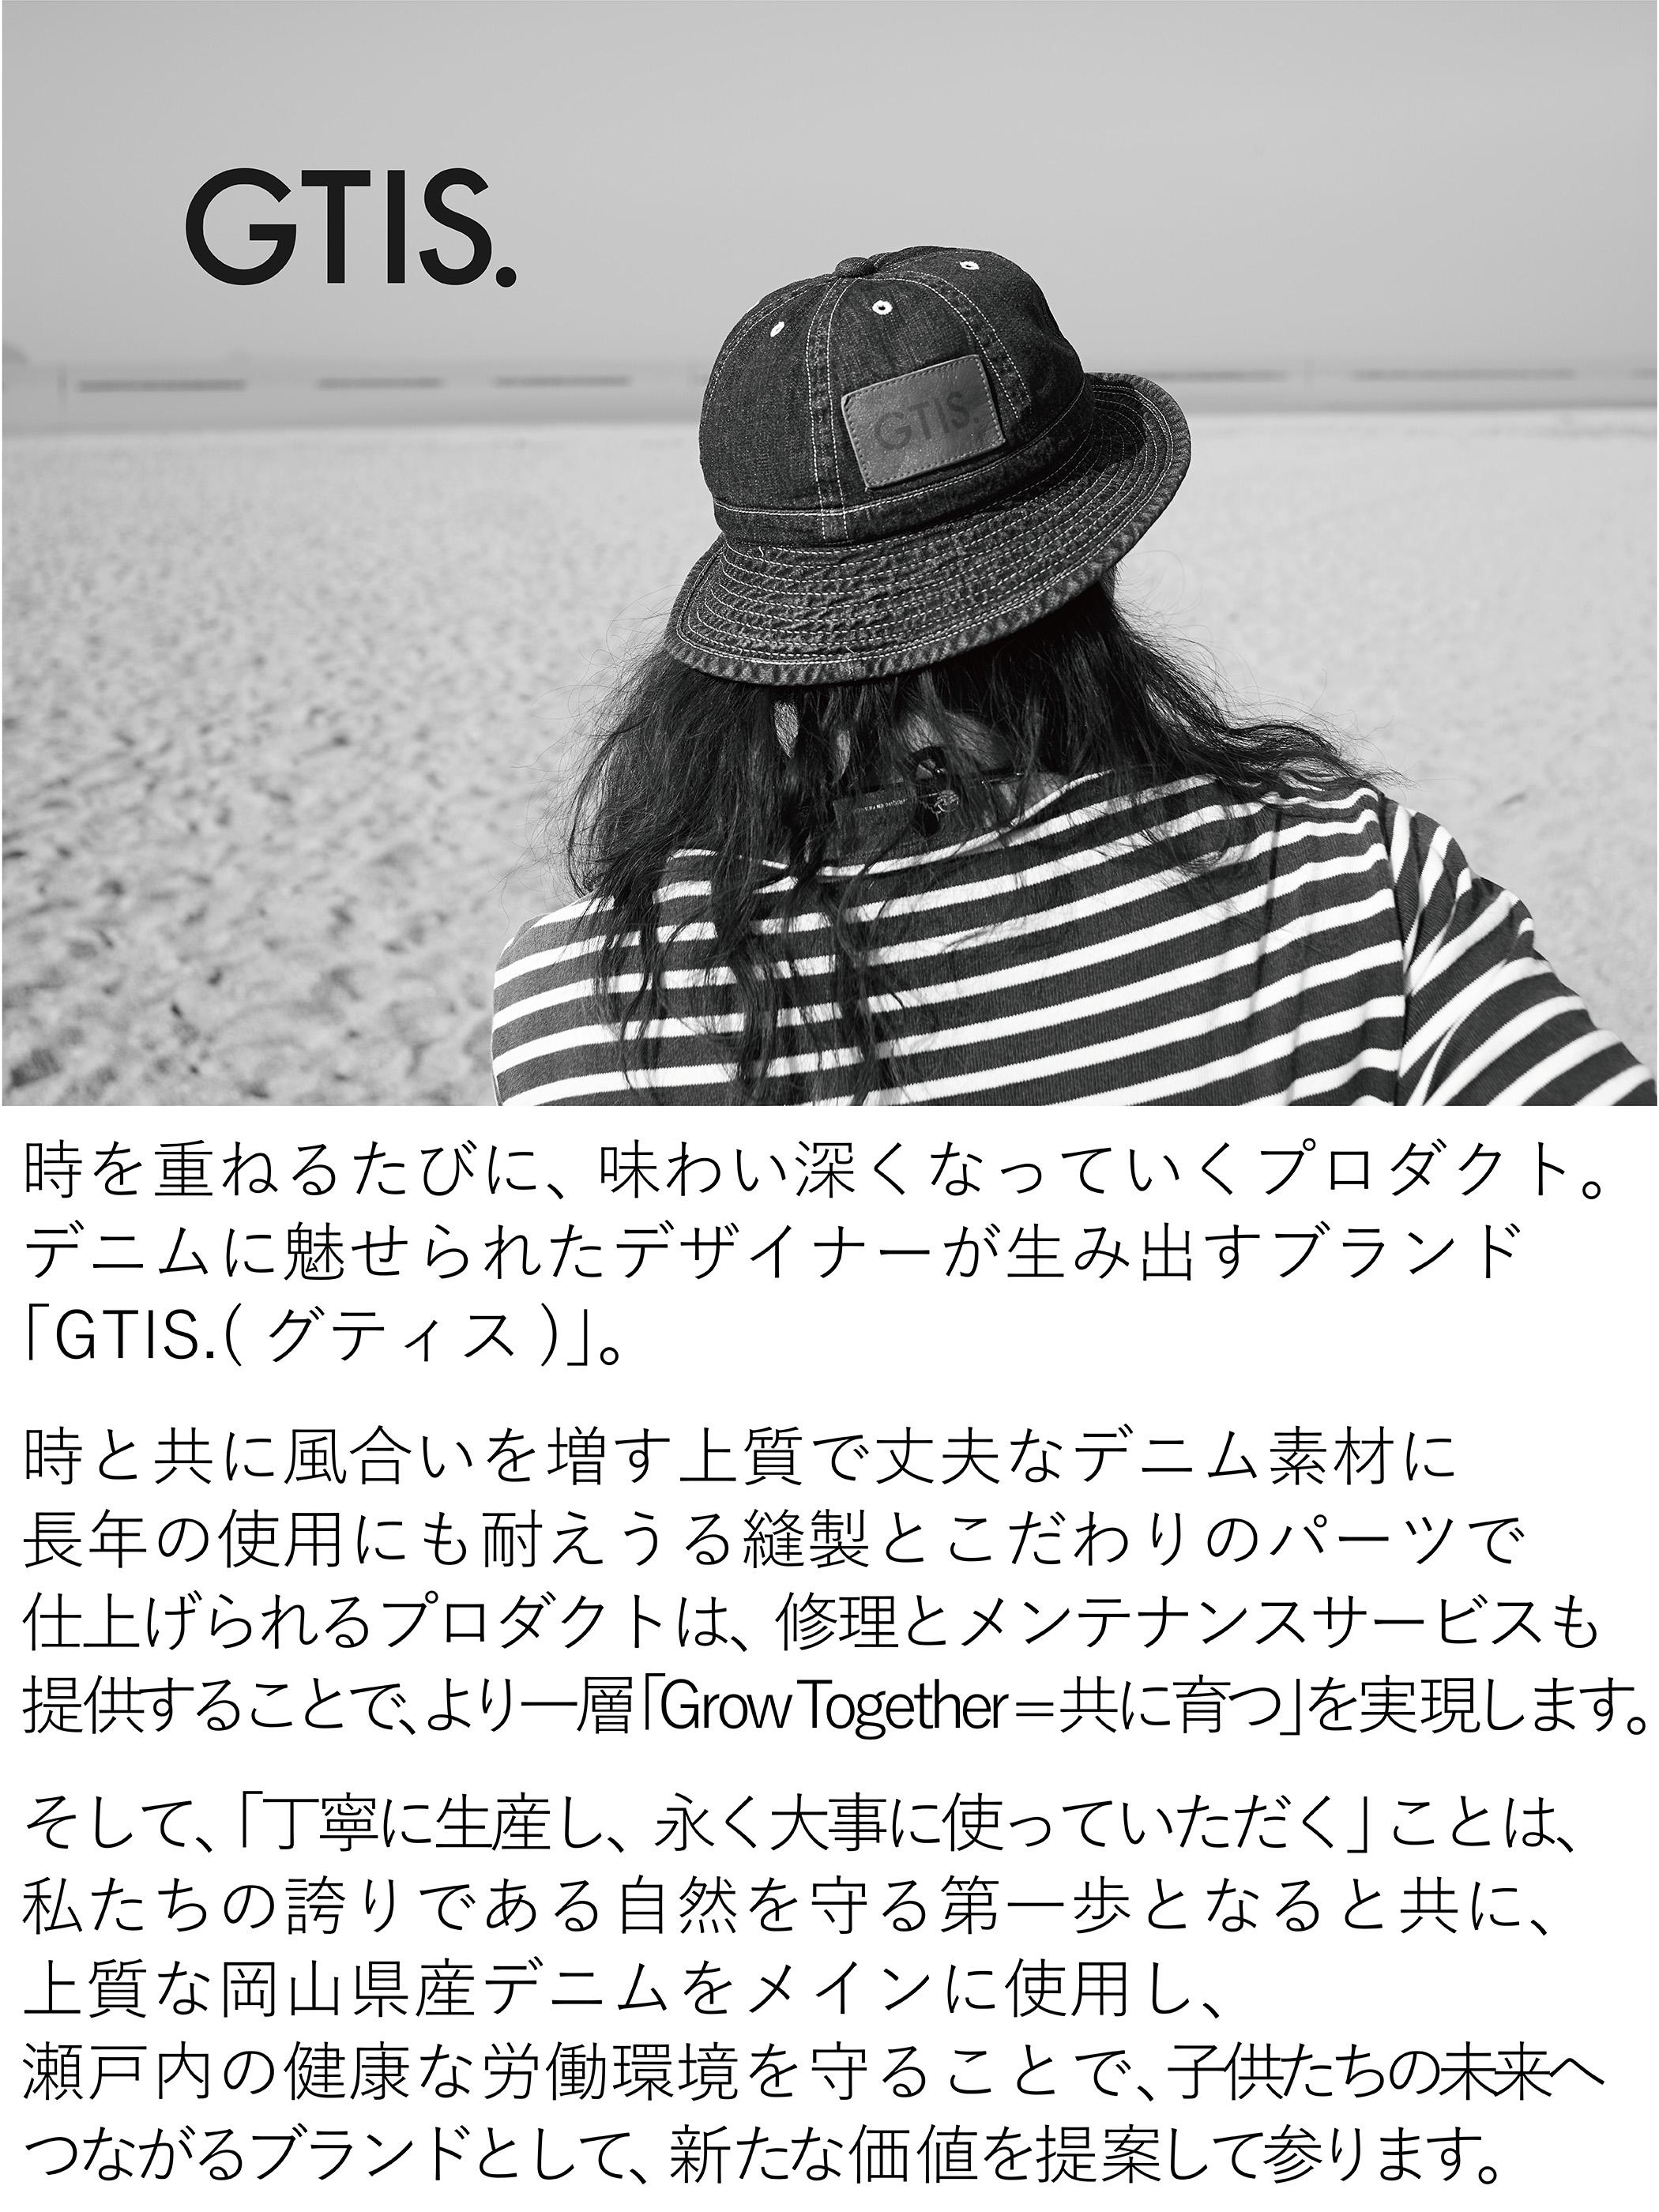 Ec brand image 01